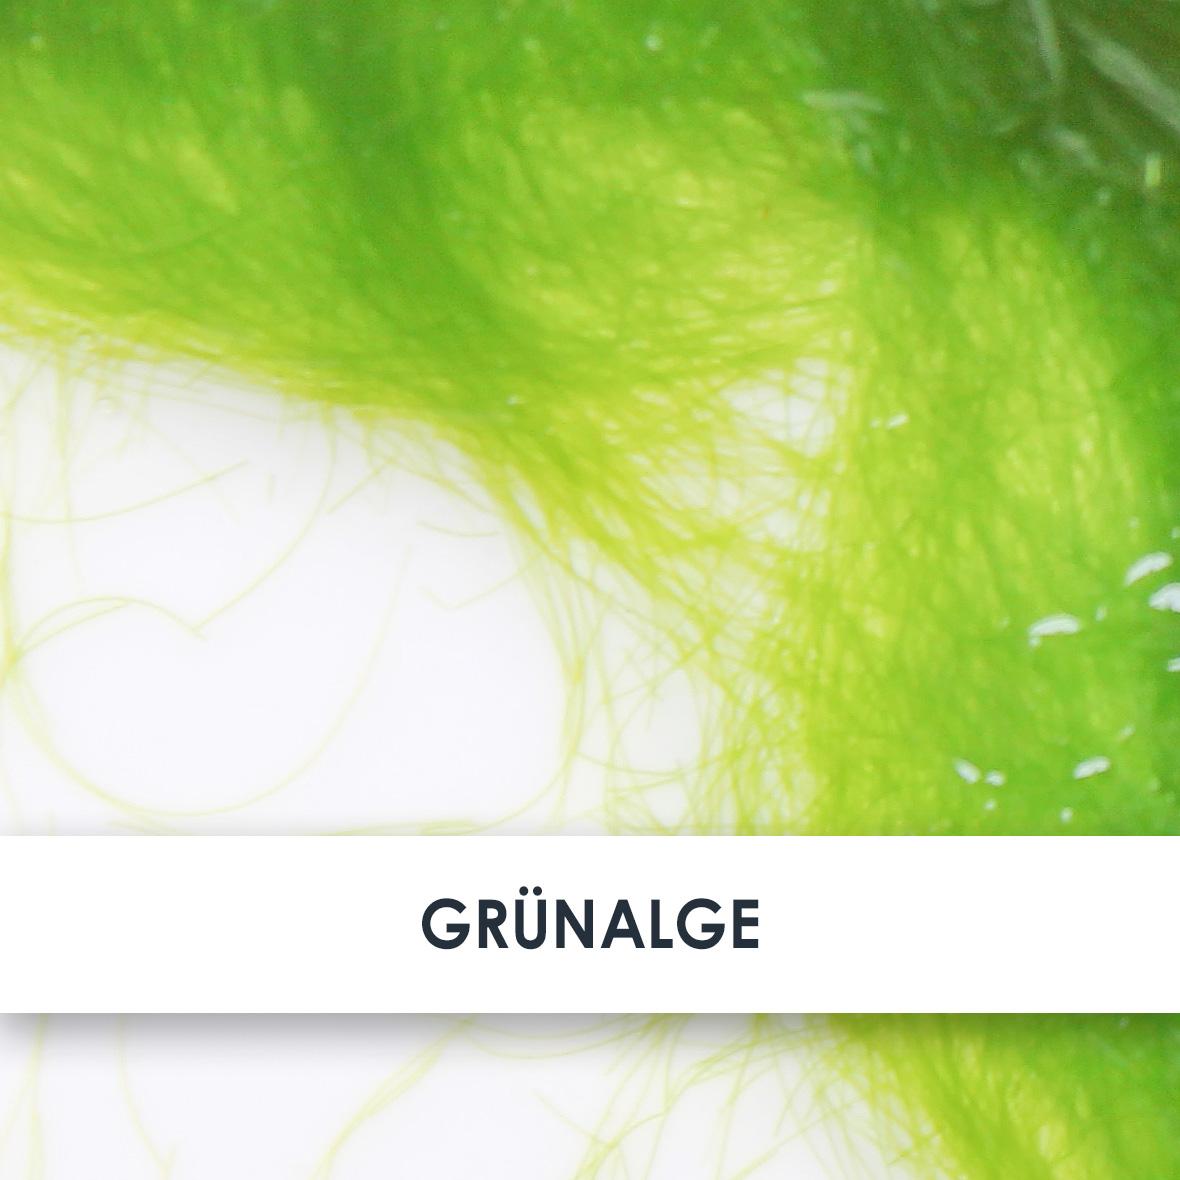 Wirkstoff Grünalge